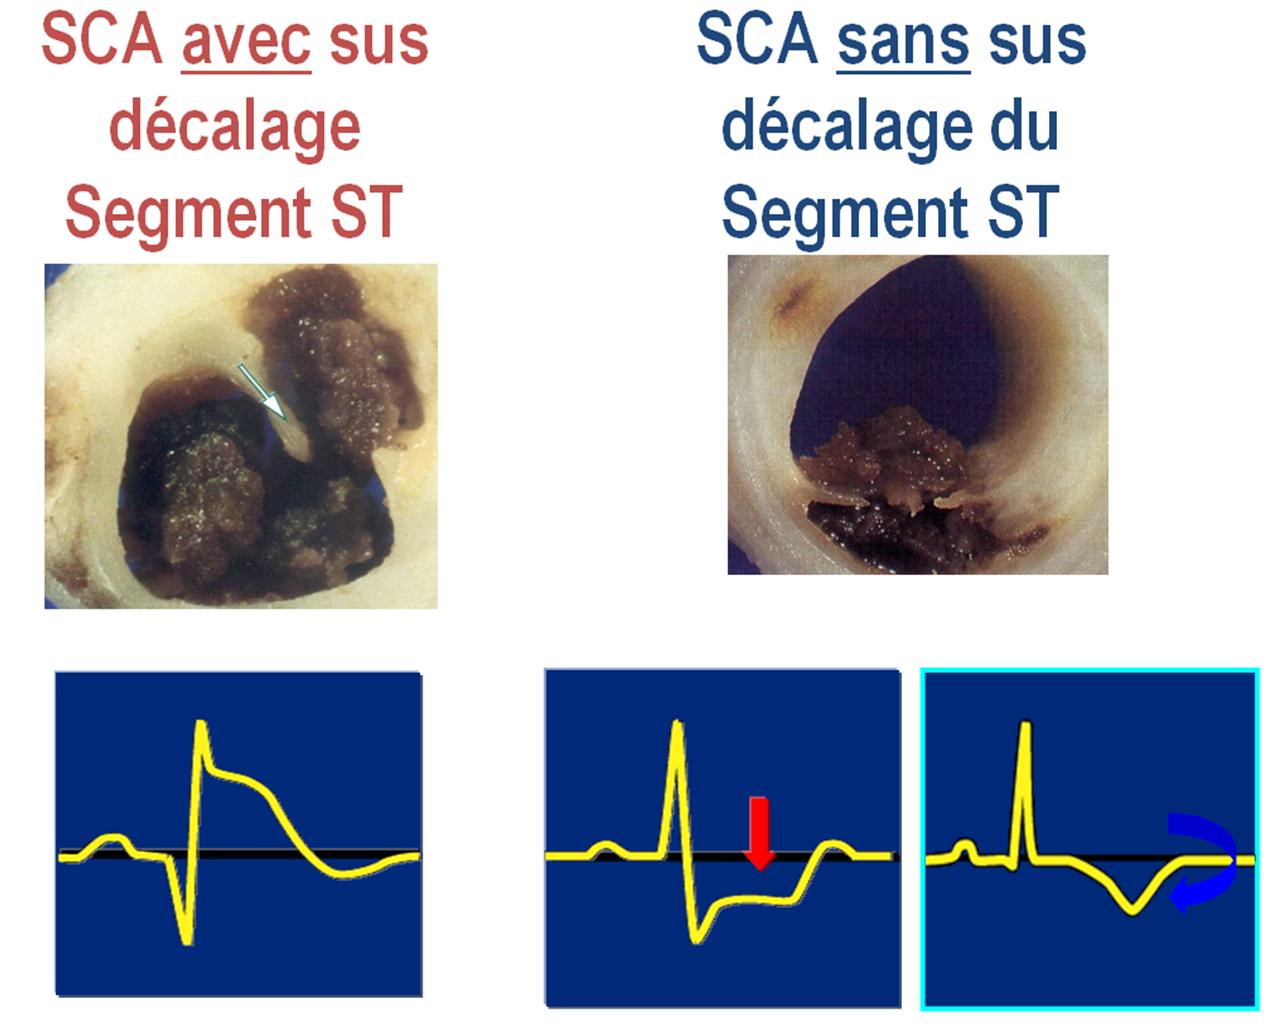 syndrome coronarien aigu aux urgences